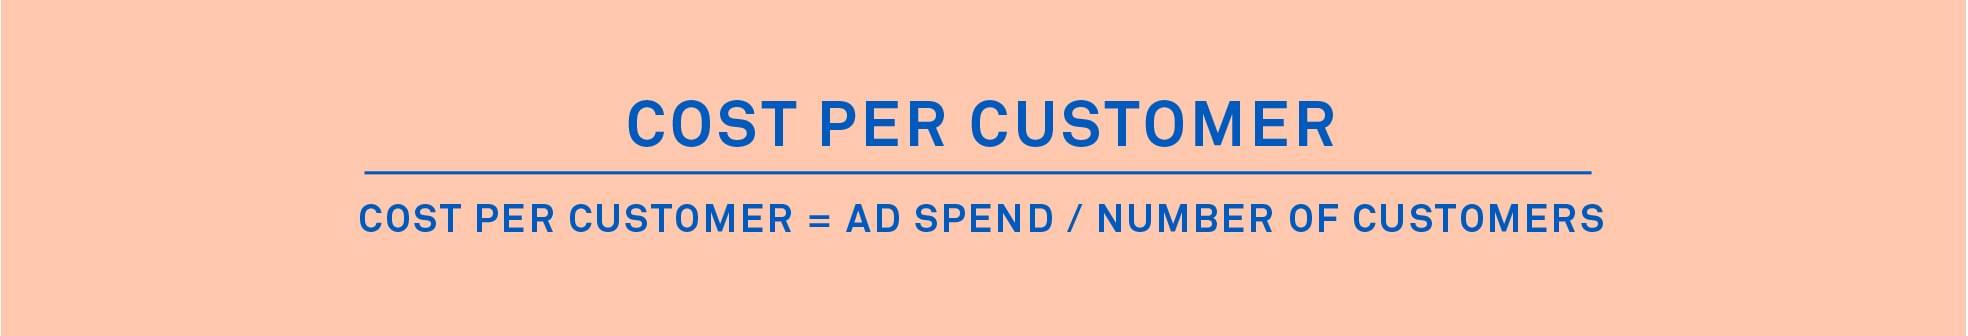 Cost per customer formula